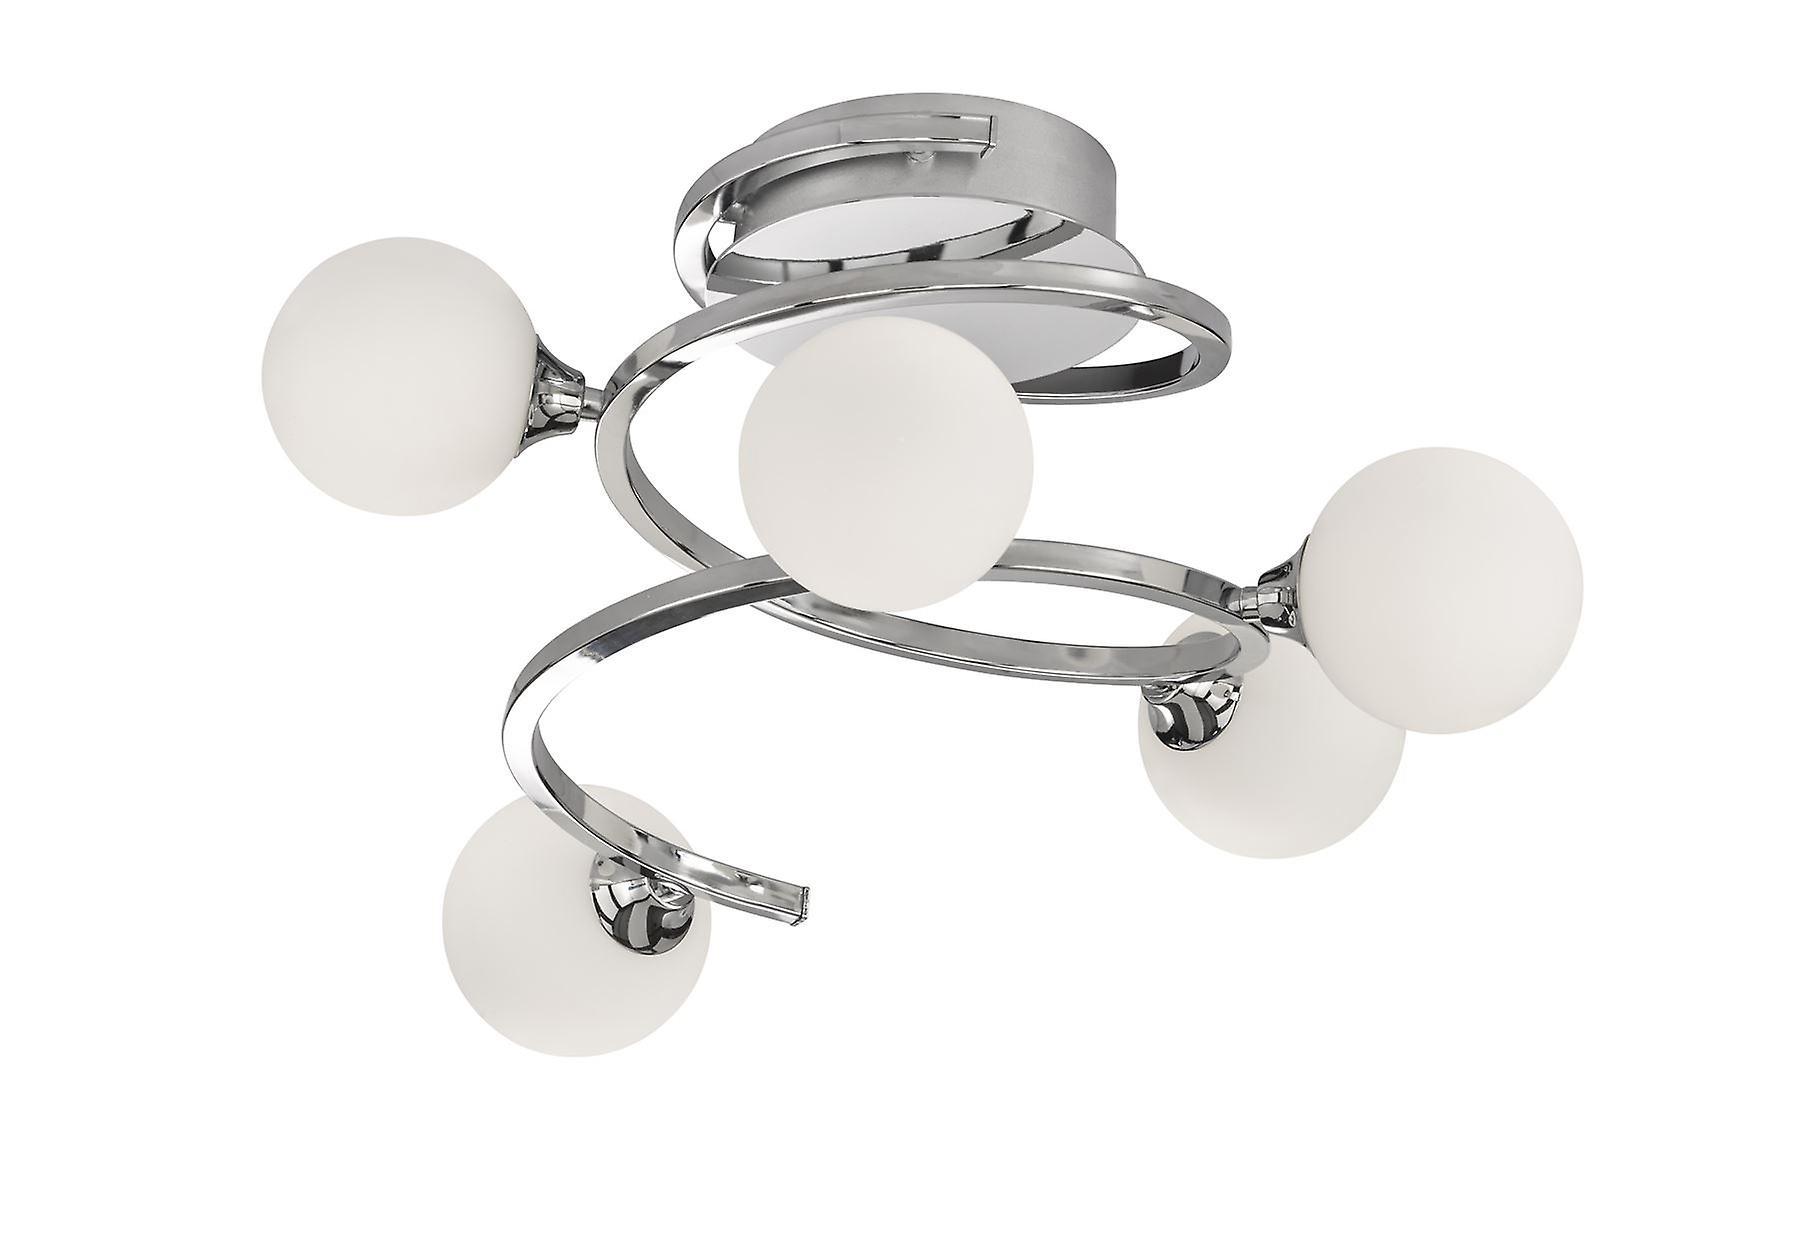 Wofi Avery - 5 Light Flush Plafond Lumière Chrome - 9188.05.01.8000